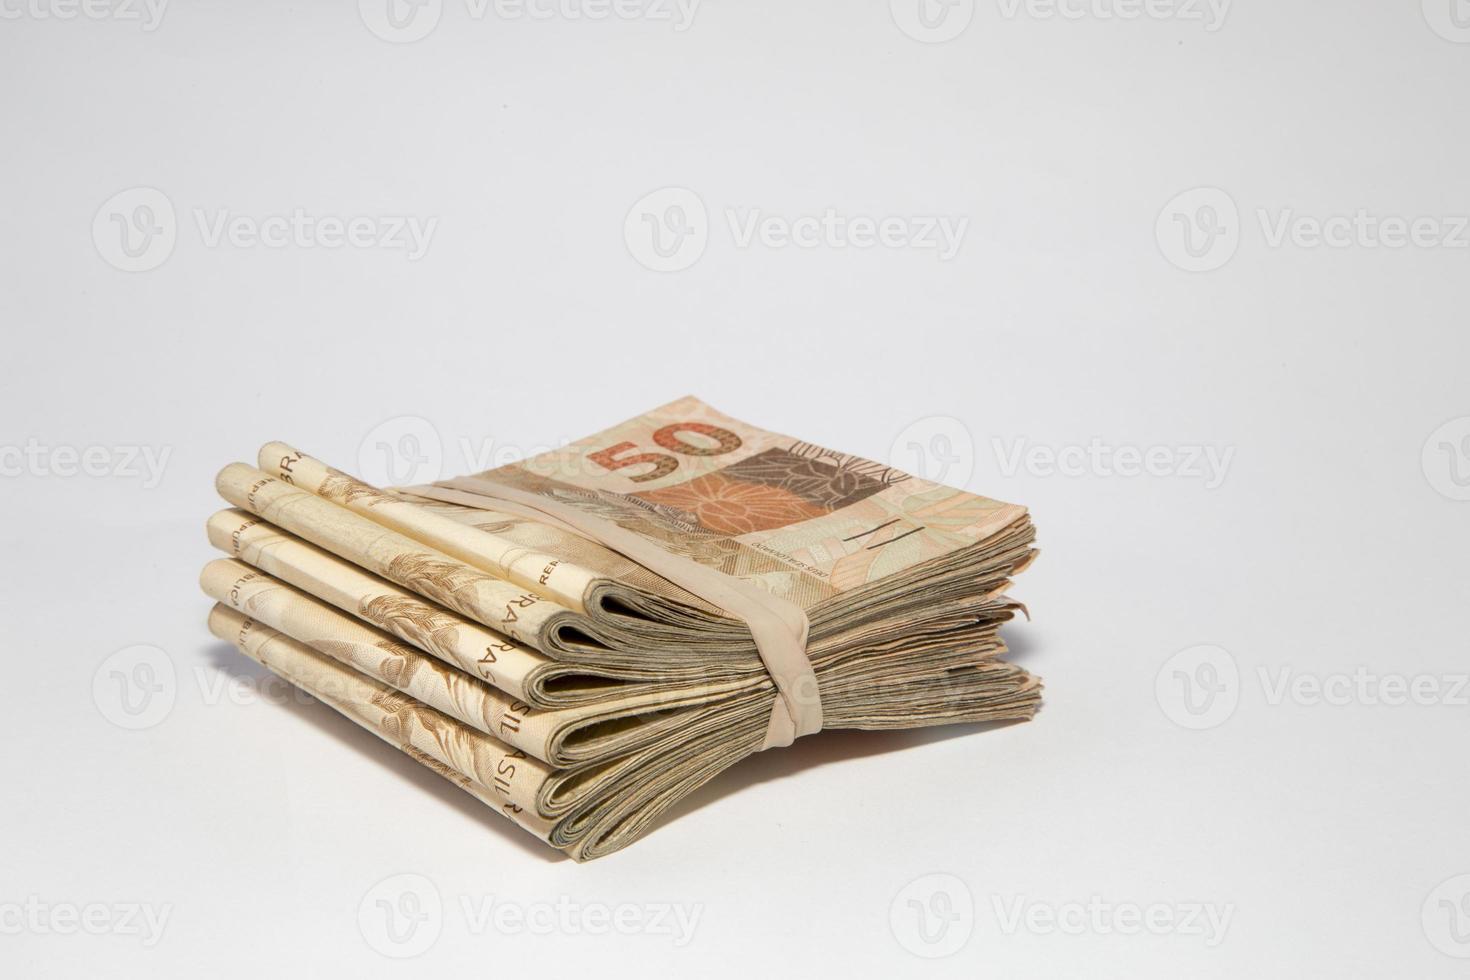 Brazilian money on the table photo